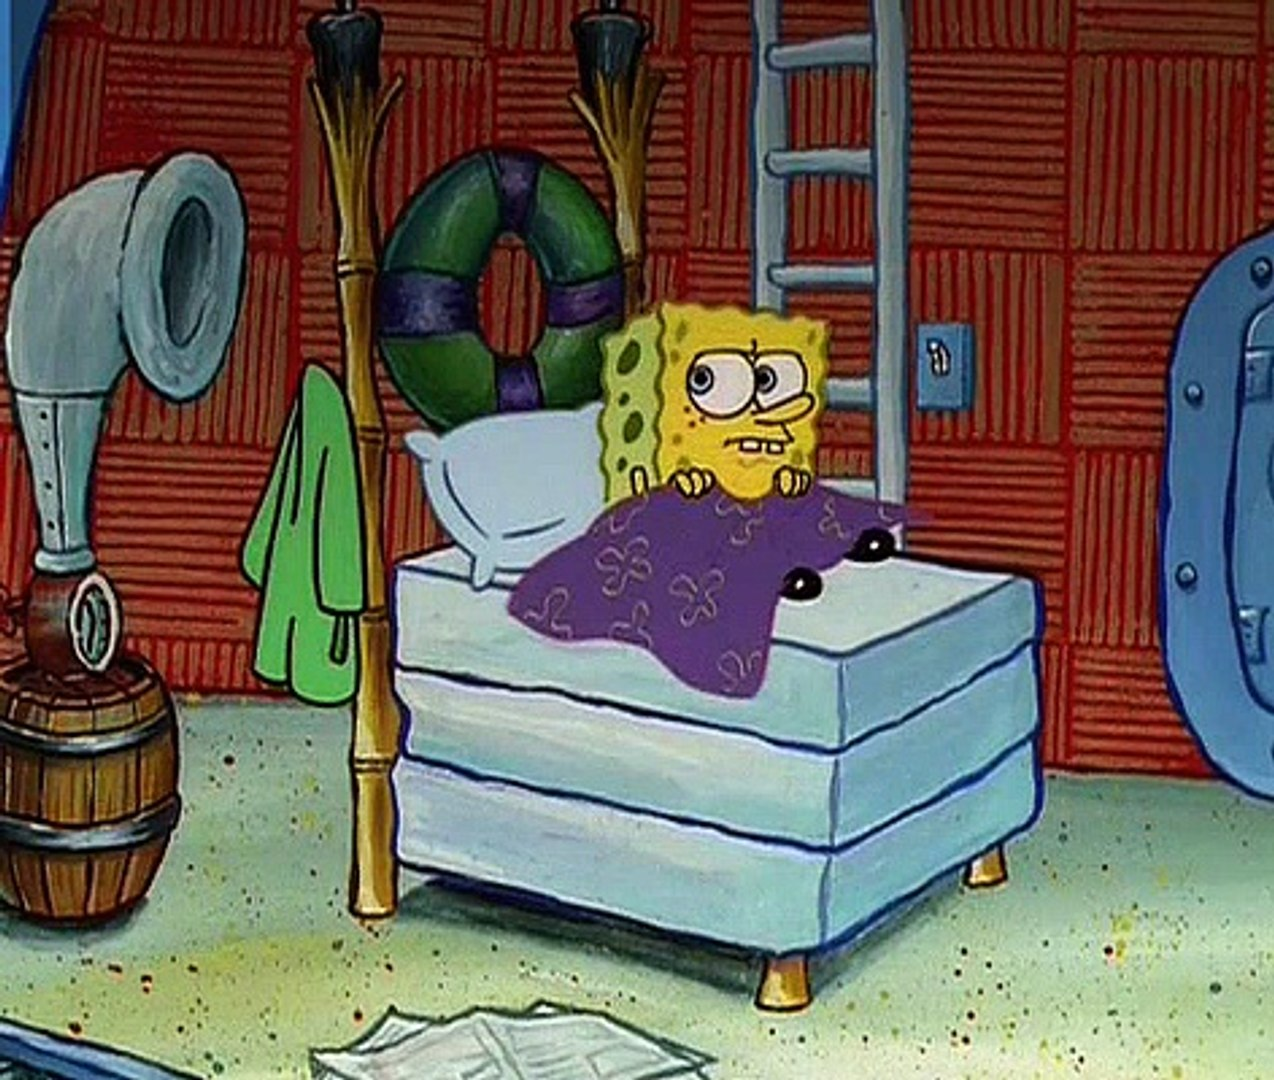 SpongeBob SquarePants - S01E15 - Jellyfish Jam